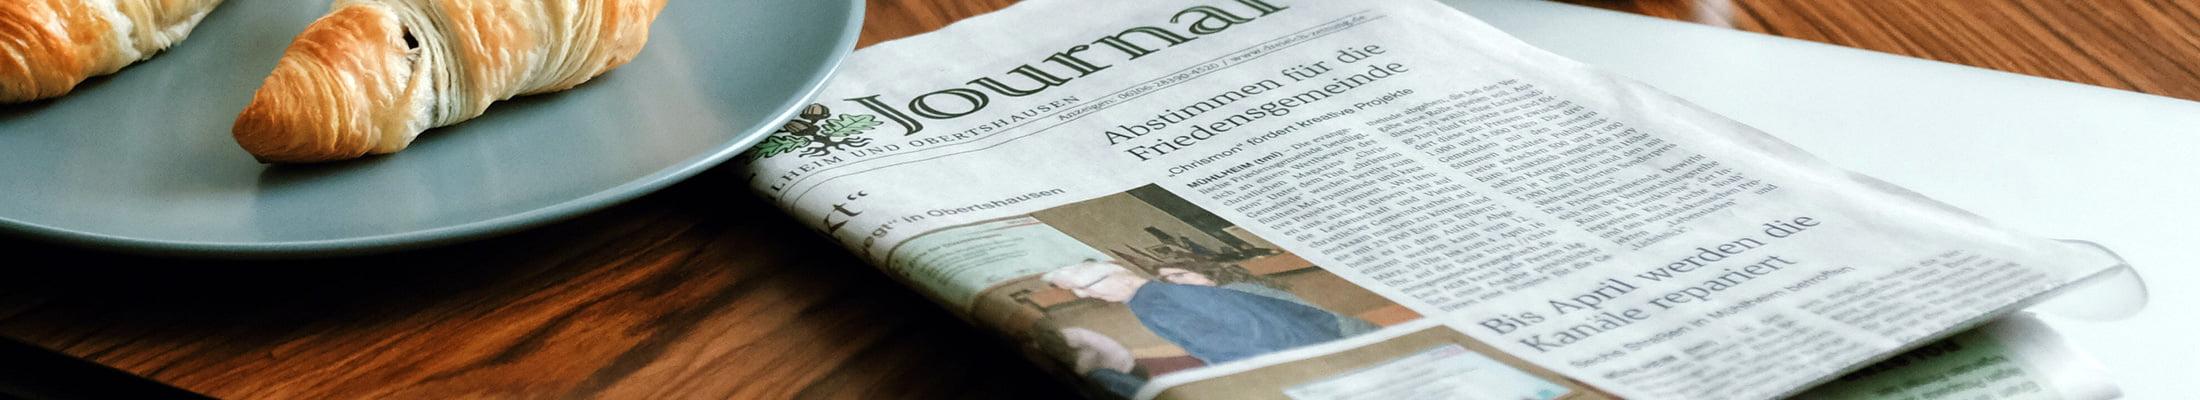 https://www.storaenso.com/-/media/images/newsroom/news-items/hero/2200x400_news.jpg